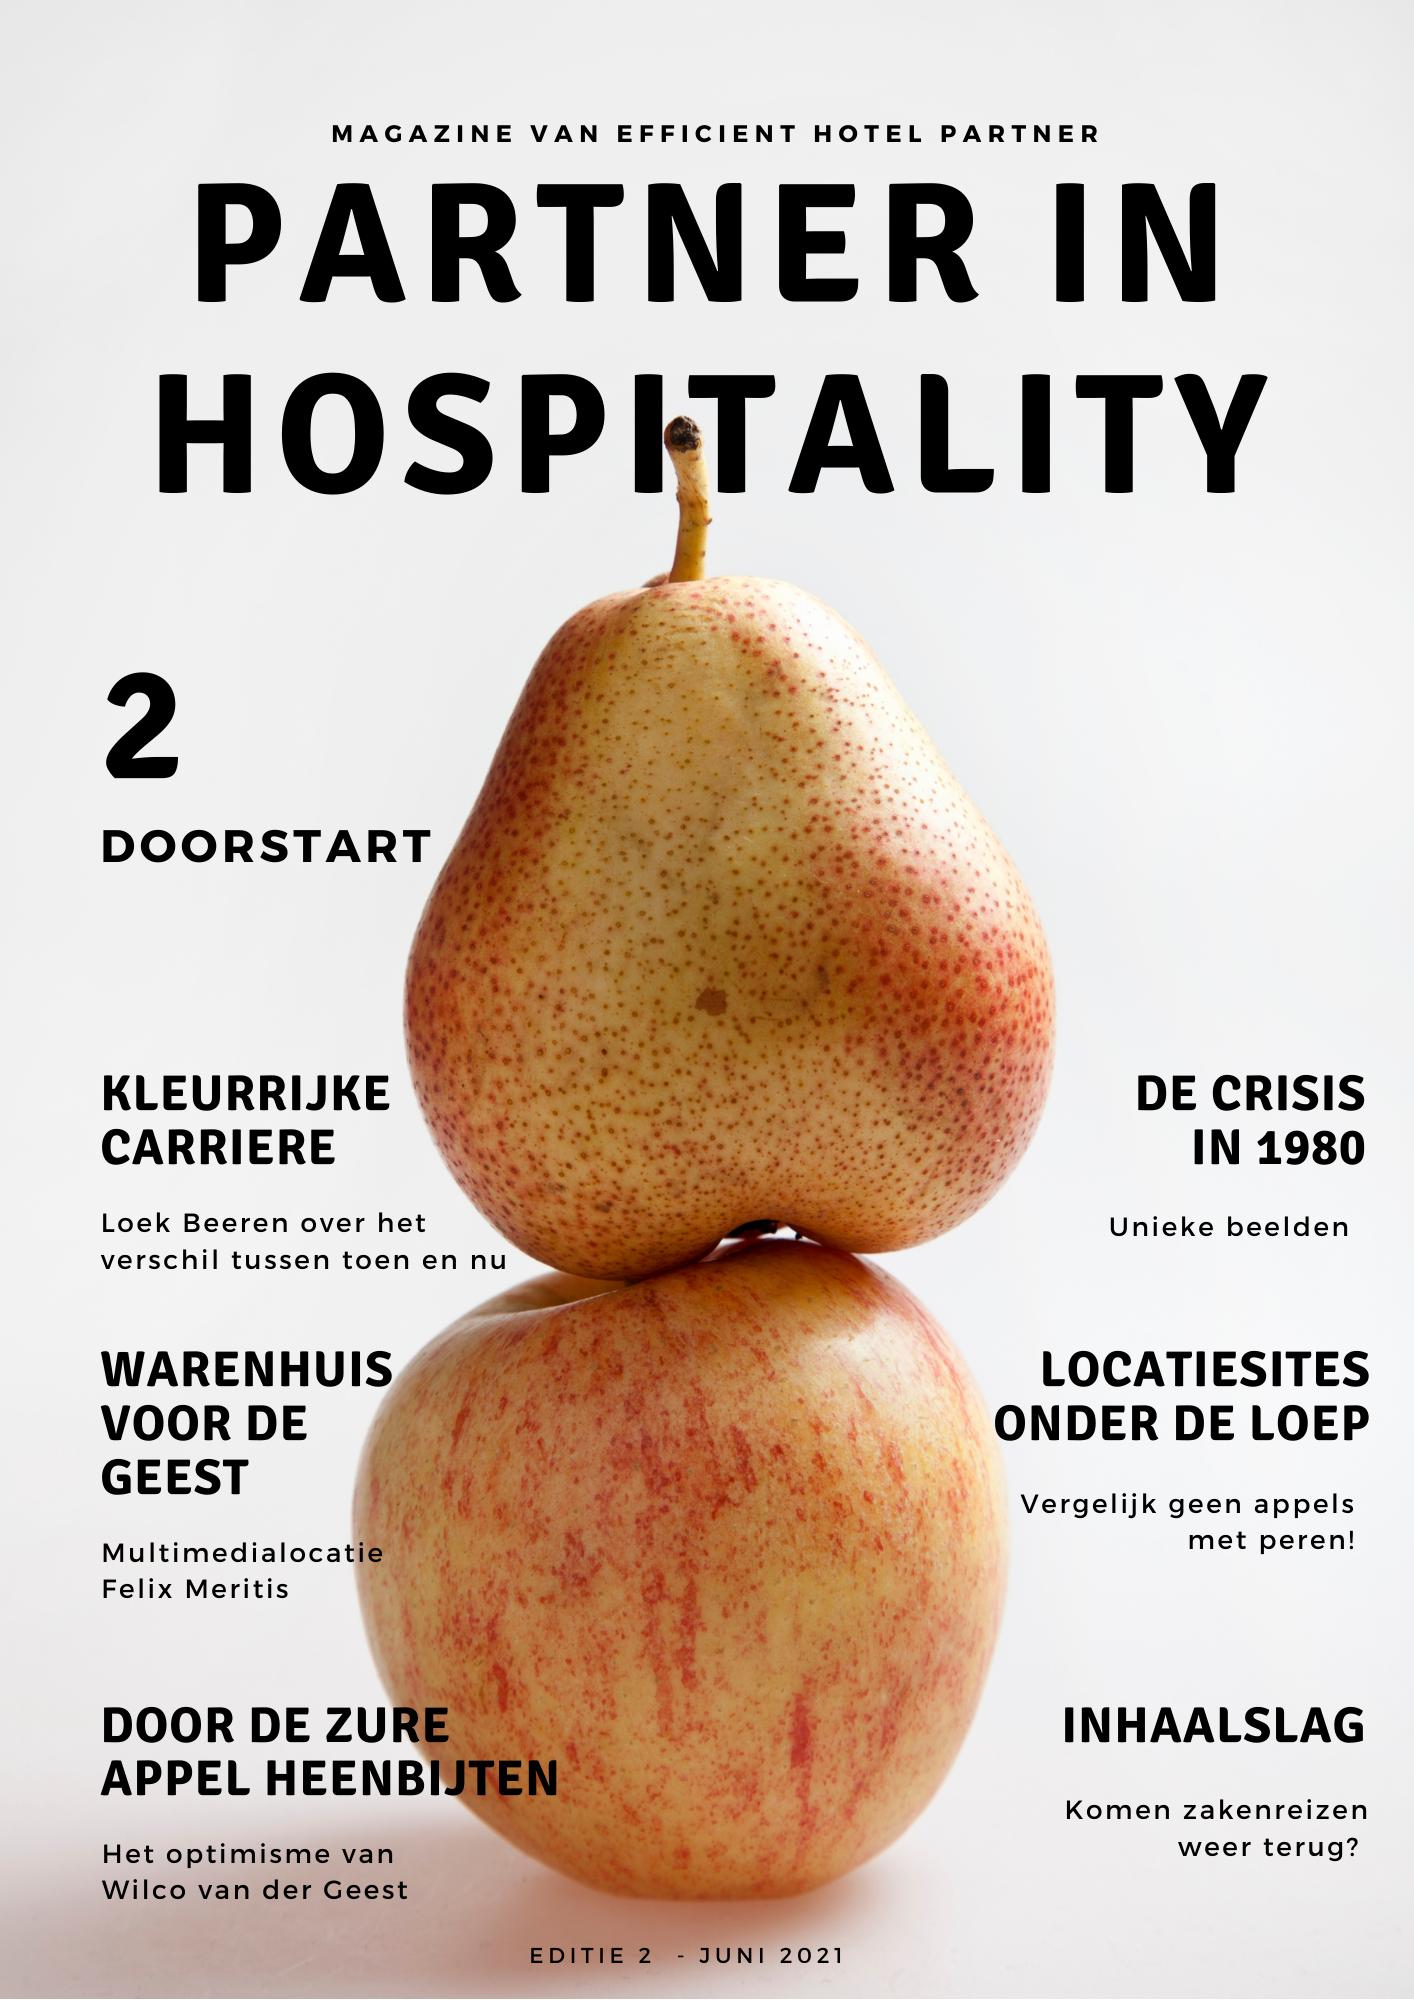 Partner in Hospitality | Magazine van Efficient Hotel Partner